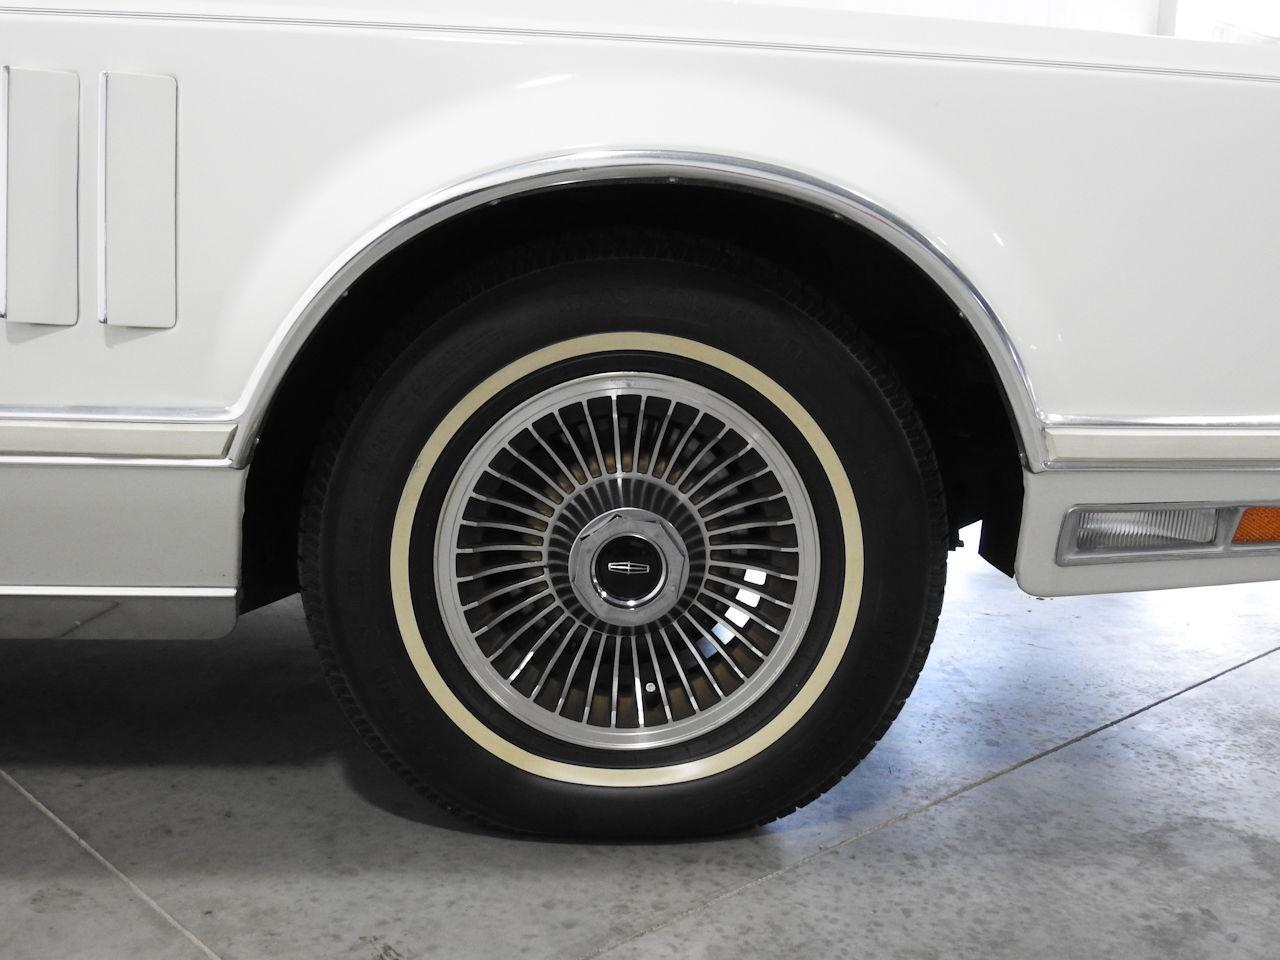 1979 Lincoln MKV 90